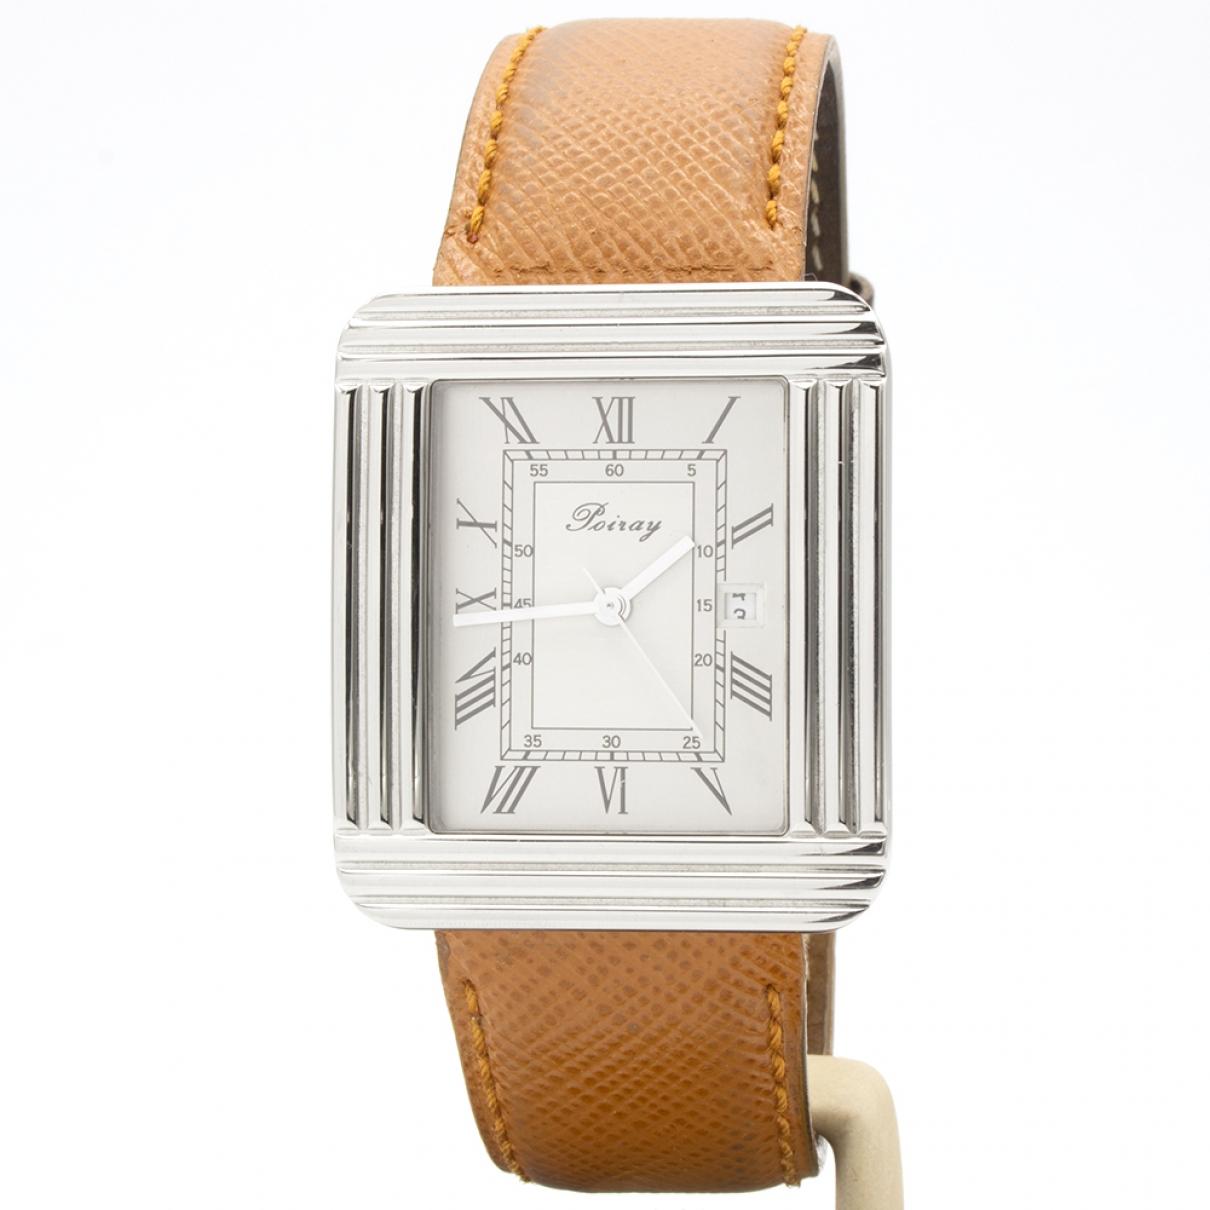 Relojes Ma Premiere Grand Modele Poiray